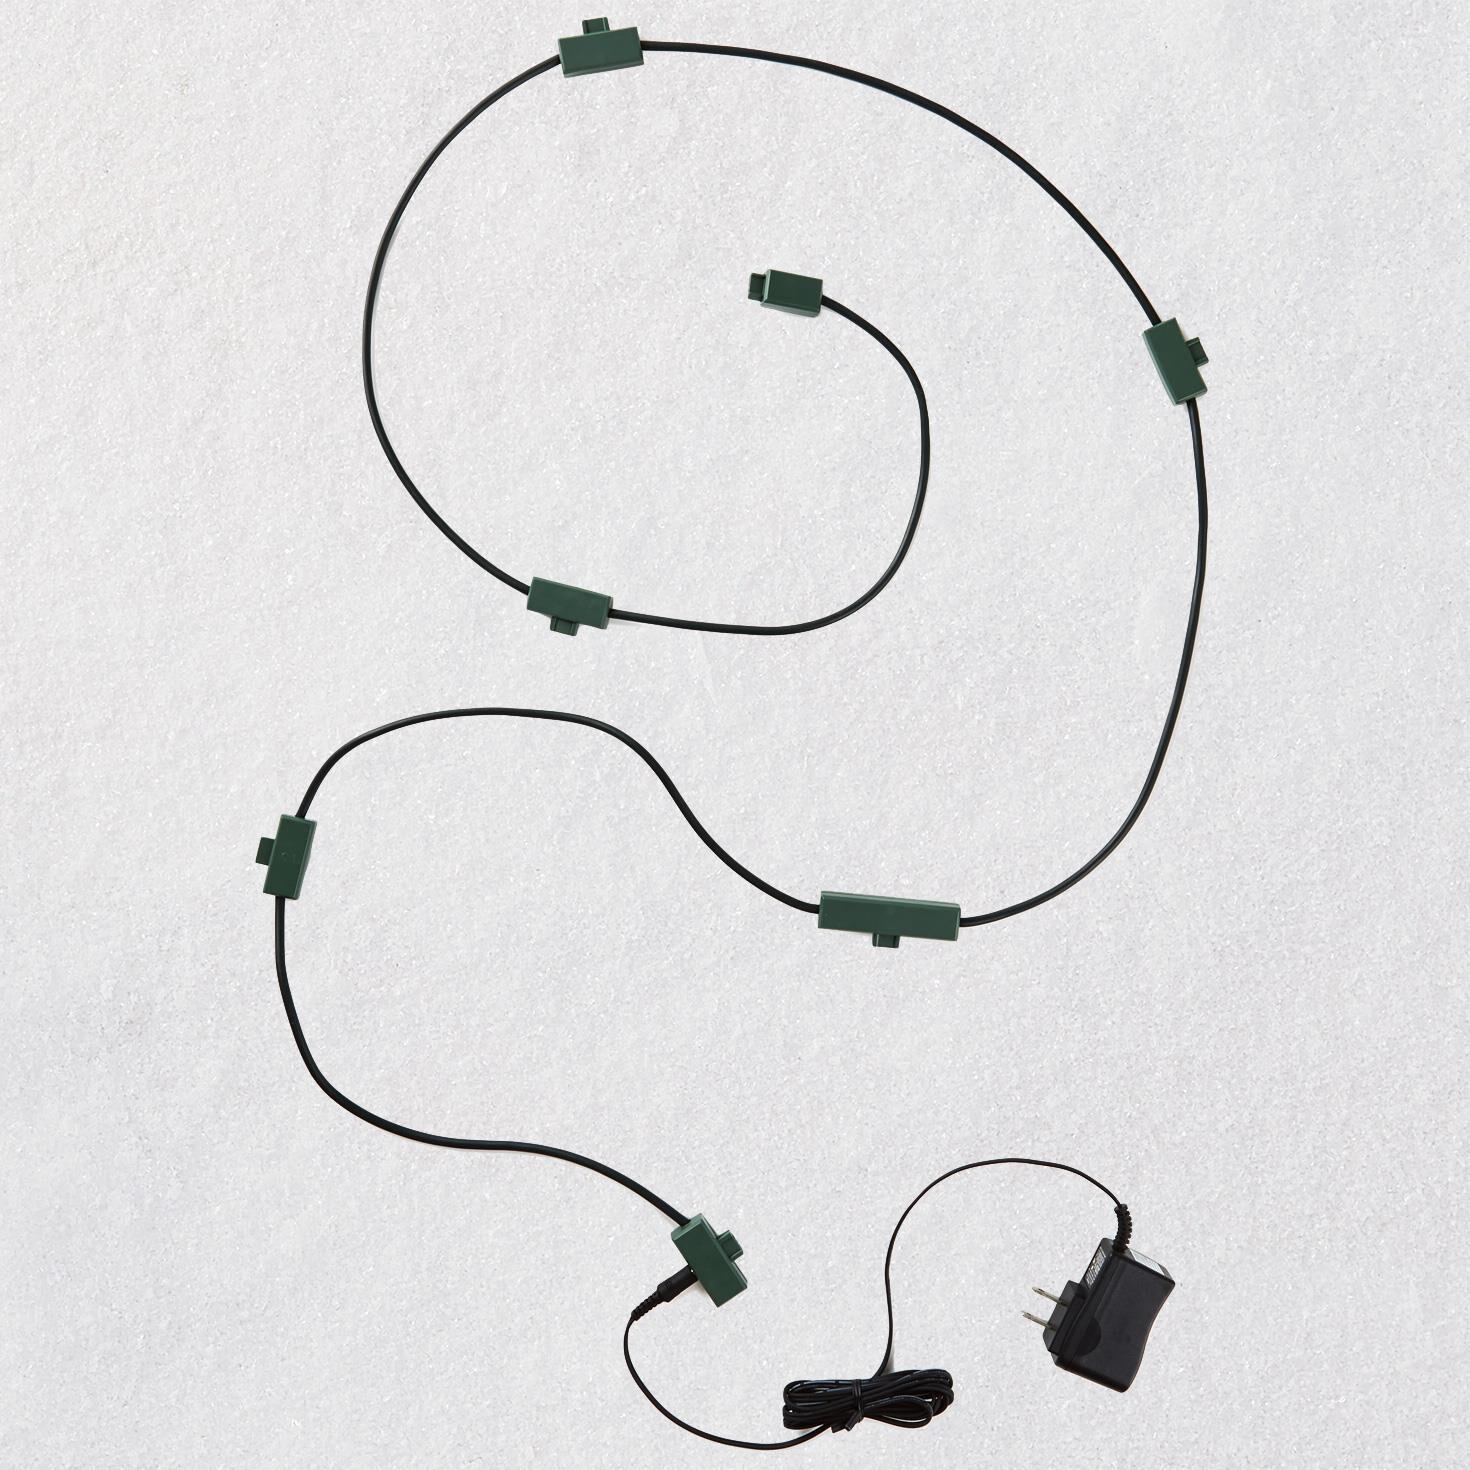 Wiring For Ornaments Trusted Diagrams Search Light Diagram Keepsake Ornament Magic Cord Hallmark Jabsco Searchlight